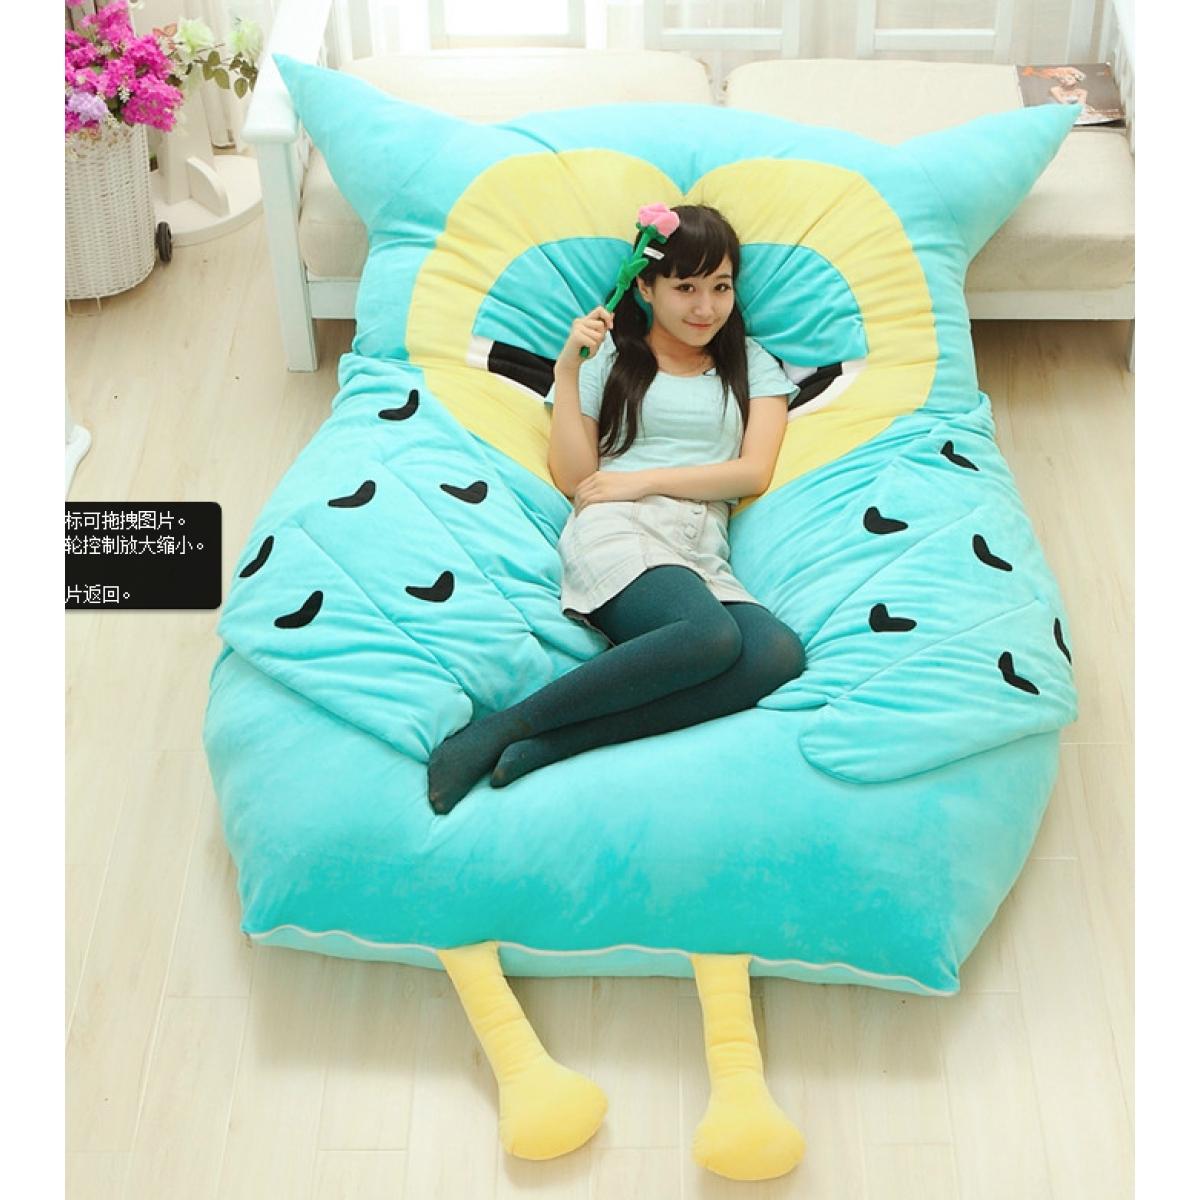 Furniture & Rug: Fancy Balkarp Sofa Bed For Living Room Furniture within Sleeping Bag Sofas (Image 3 of 15)